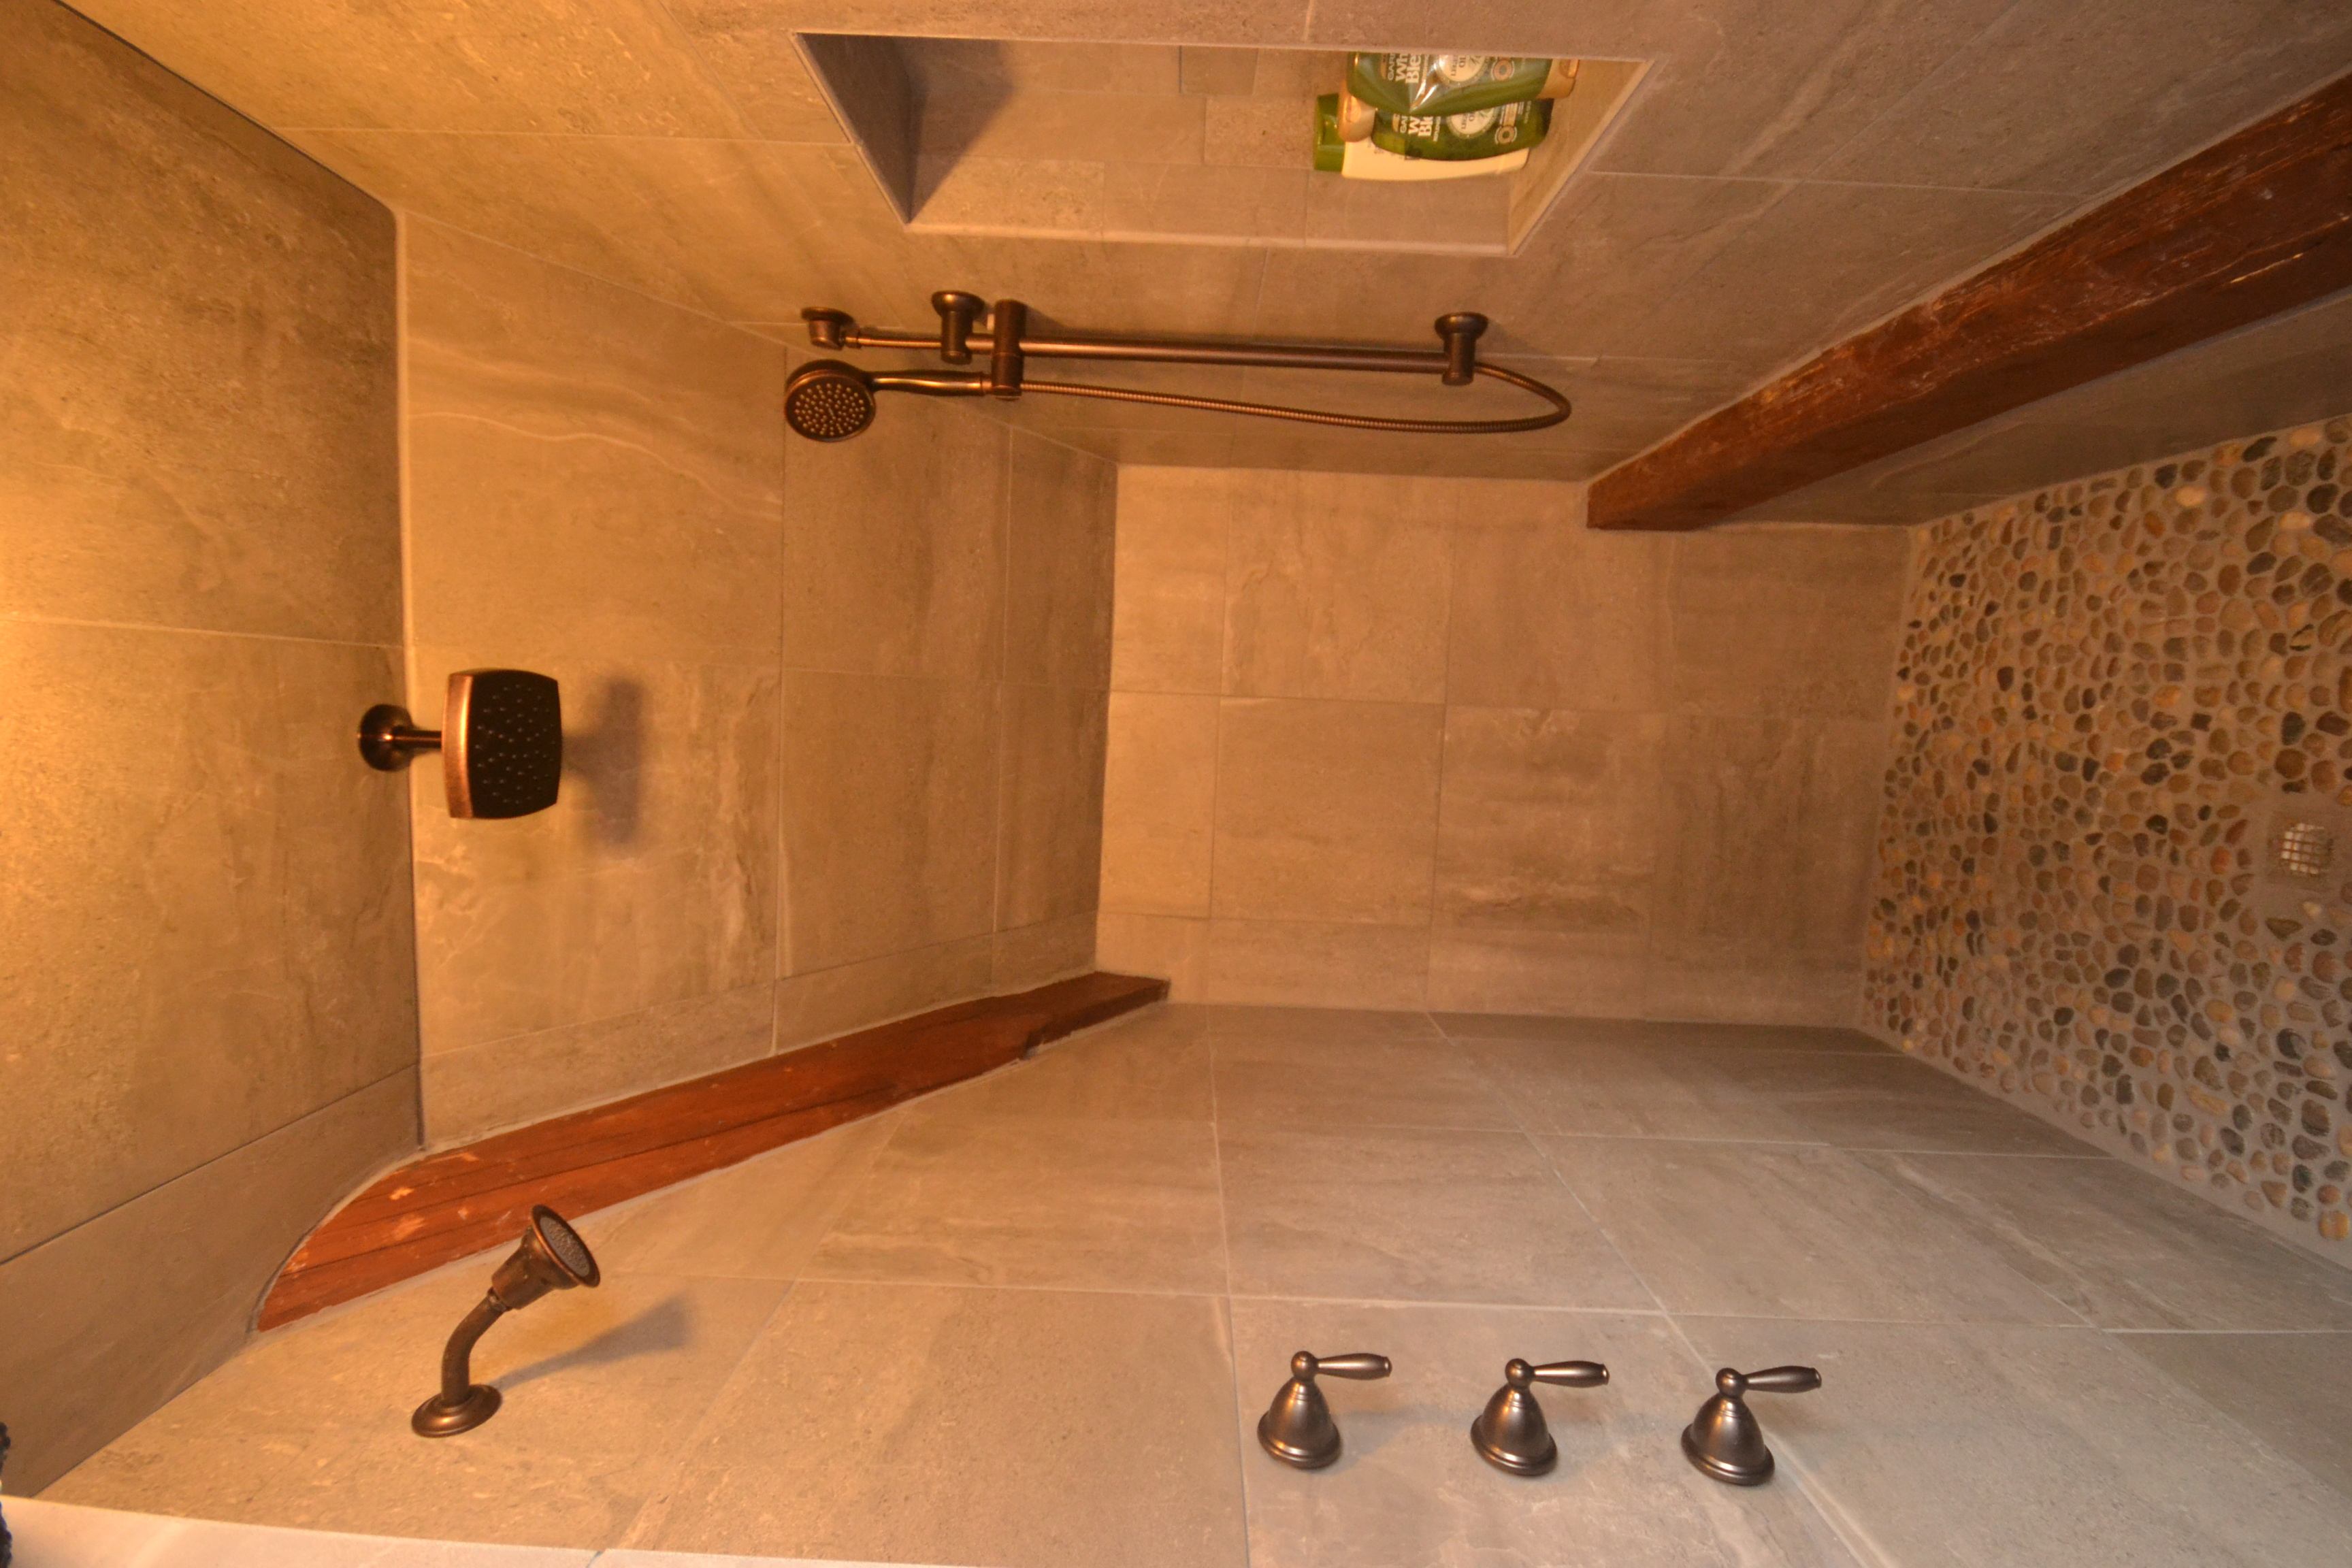 Three-Headed Shower